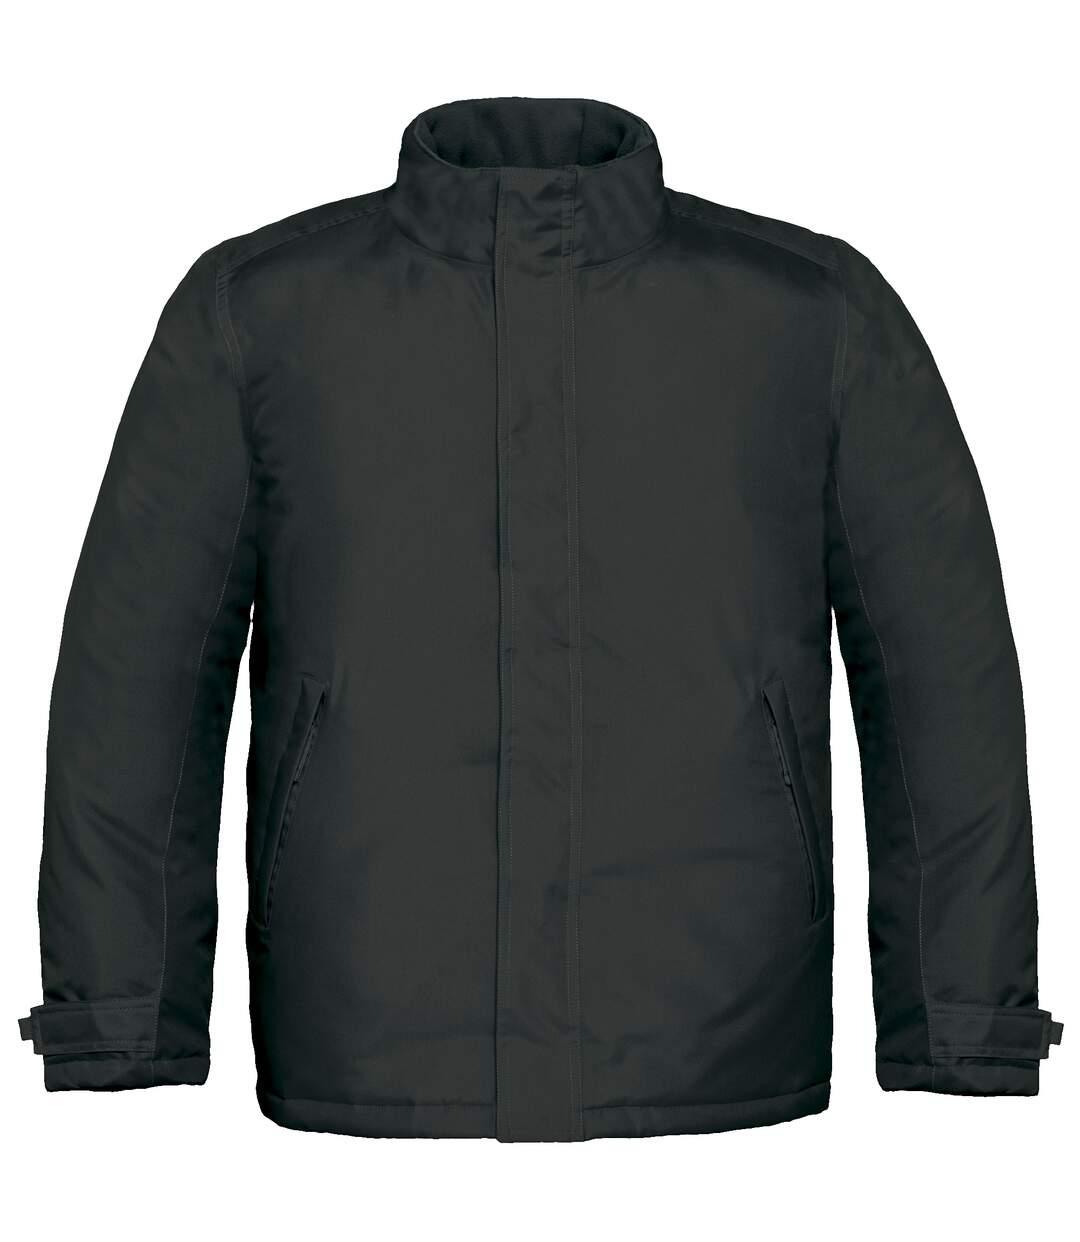 B&C Mens Real+ Premium Windproof Thermo-Isolated Jacket (Waterproof PU Coating) (Black) - UTBC2002